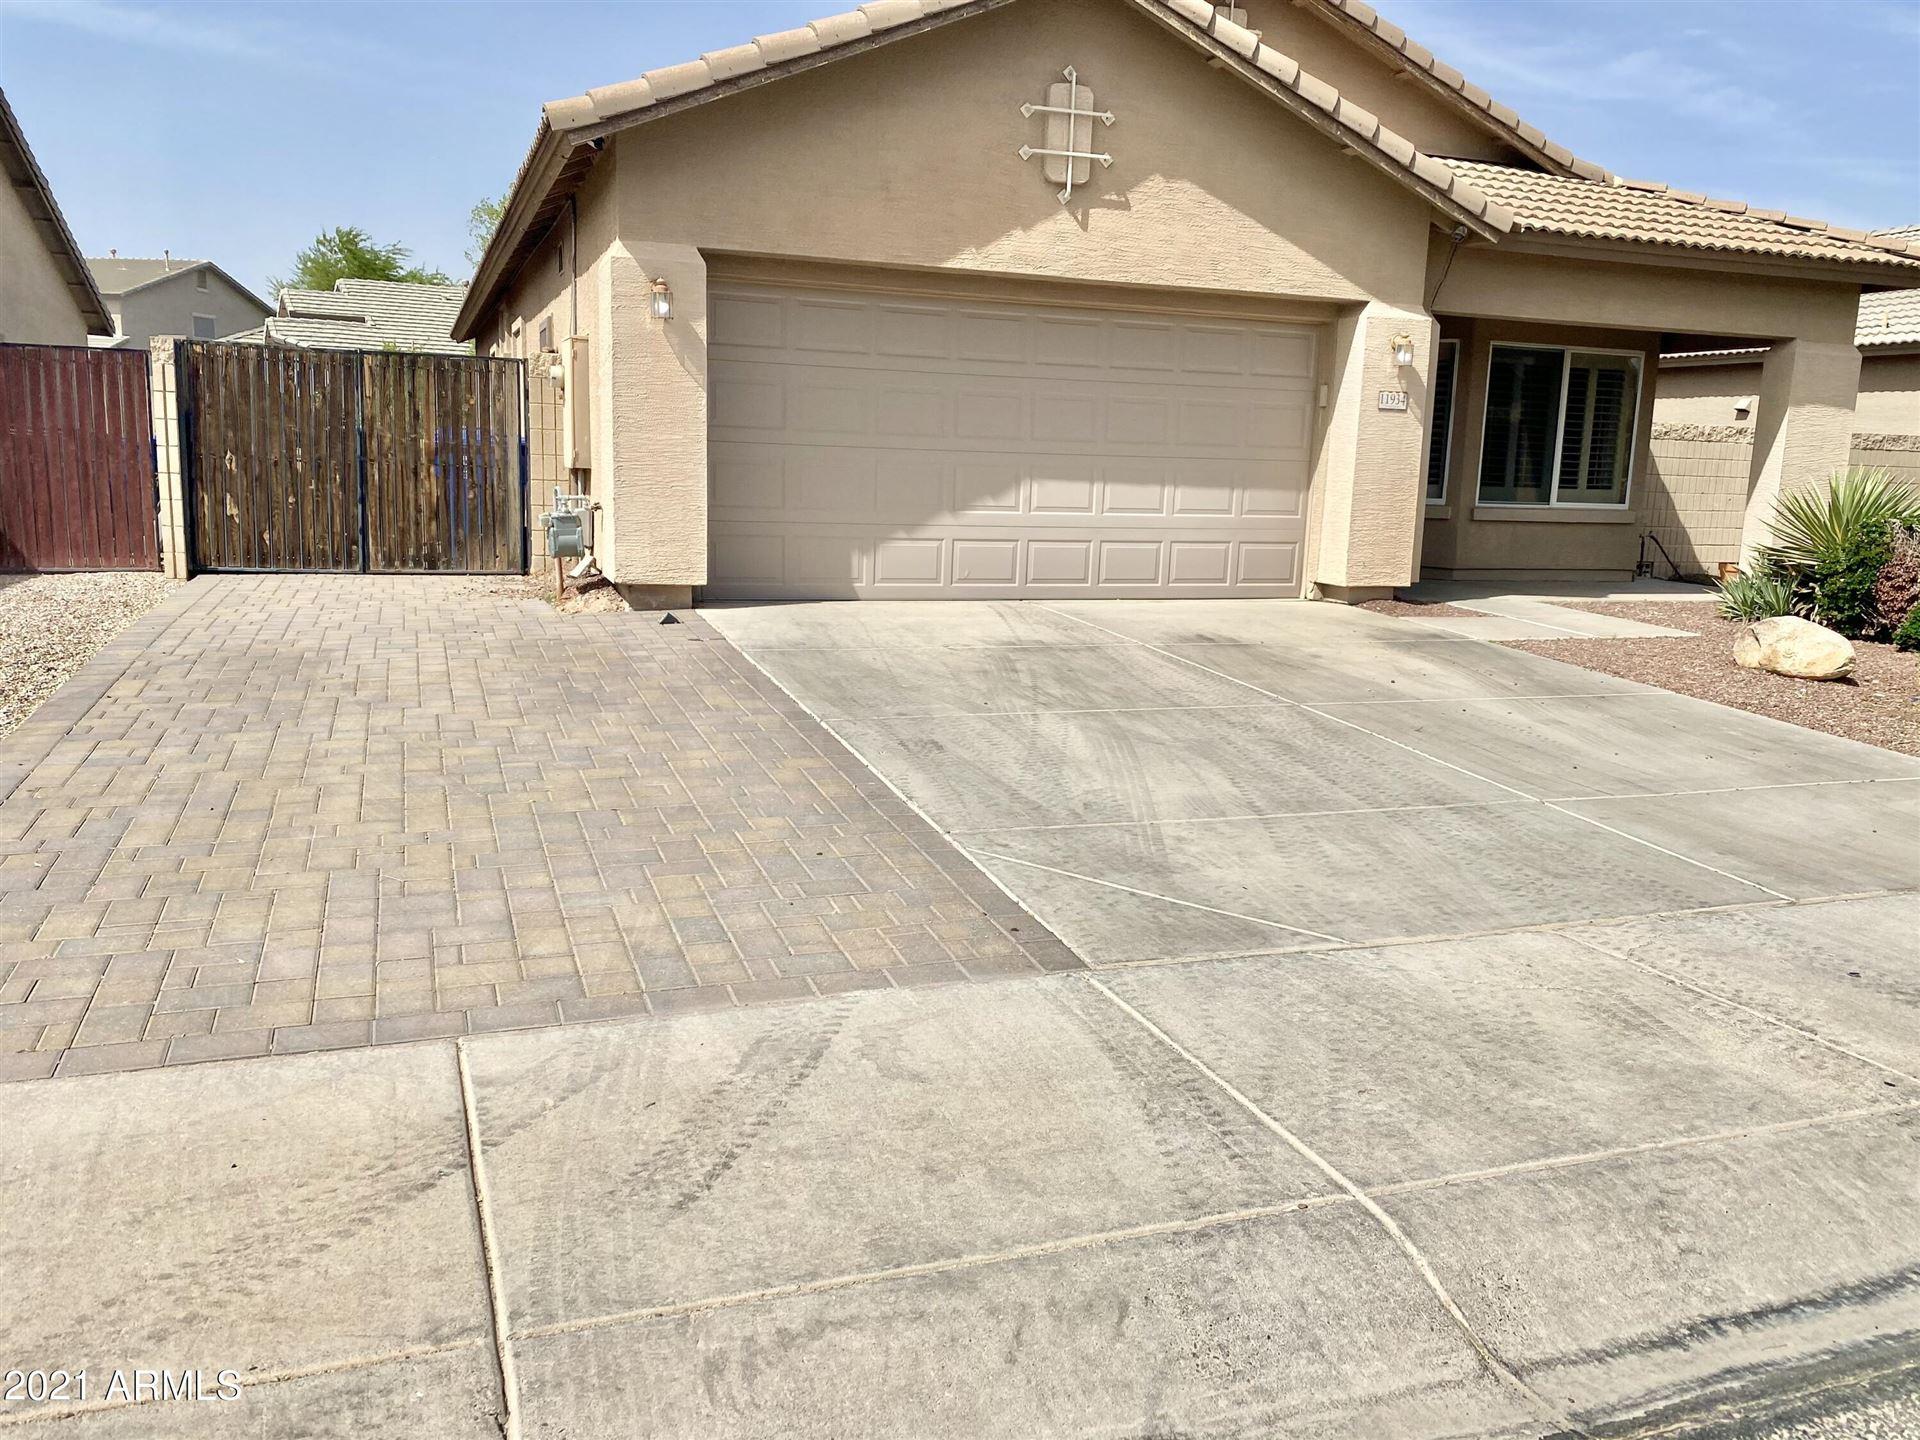 Photo of 11934 W JEFFERSON Street, Avondale, AZ 85323 (MLS # 6229036)